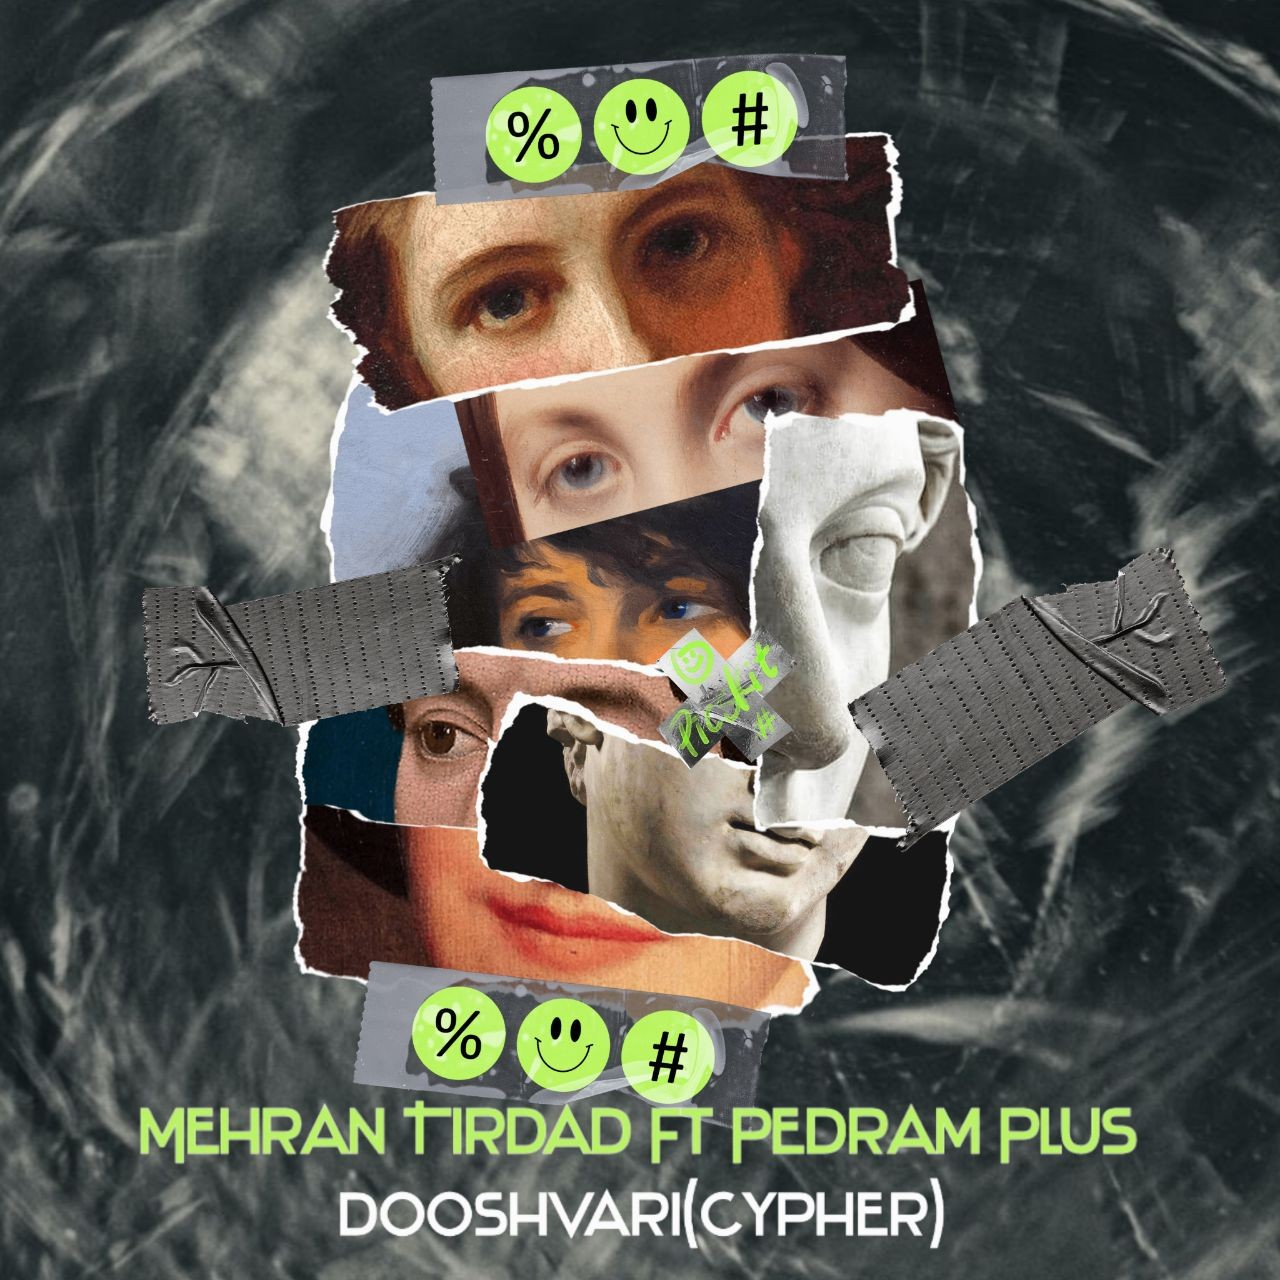 Mehran Tirdad Ft Pedram plus – Dooshvari